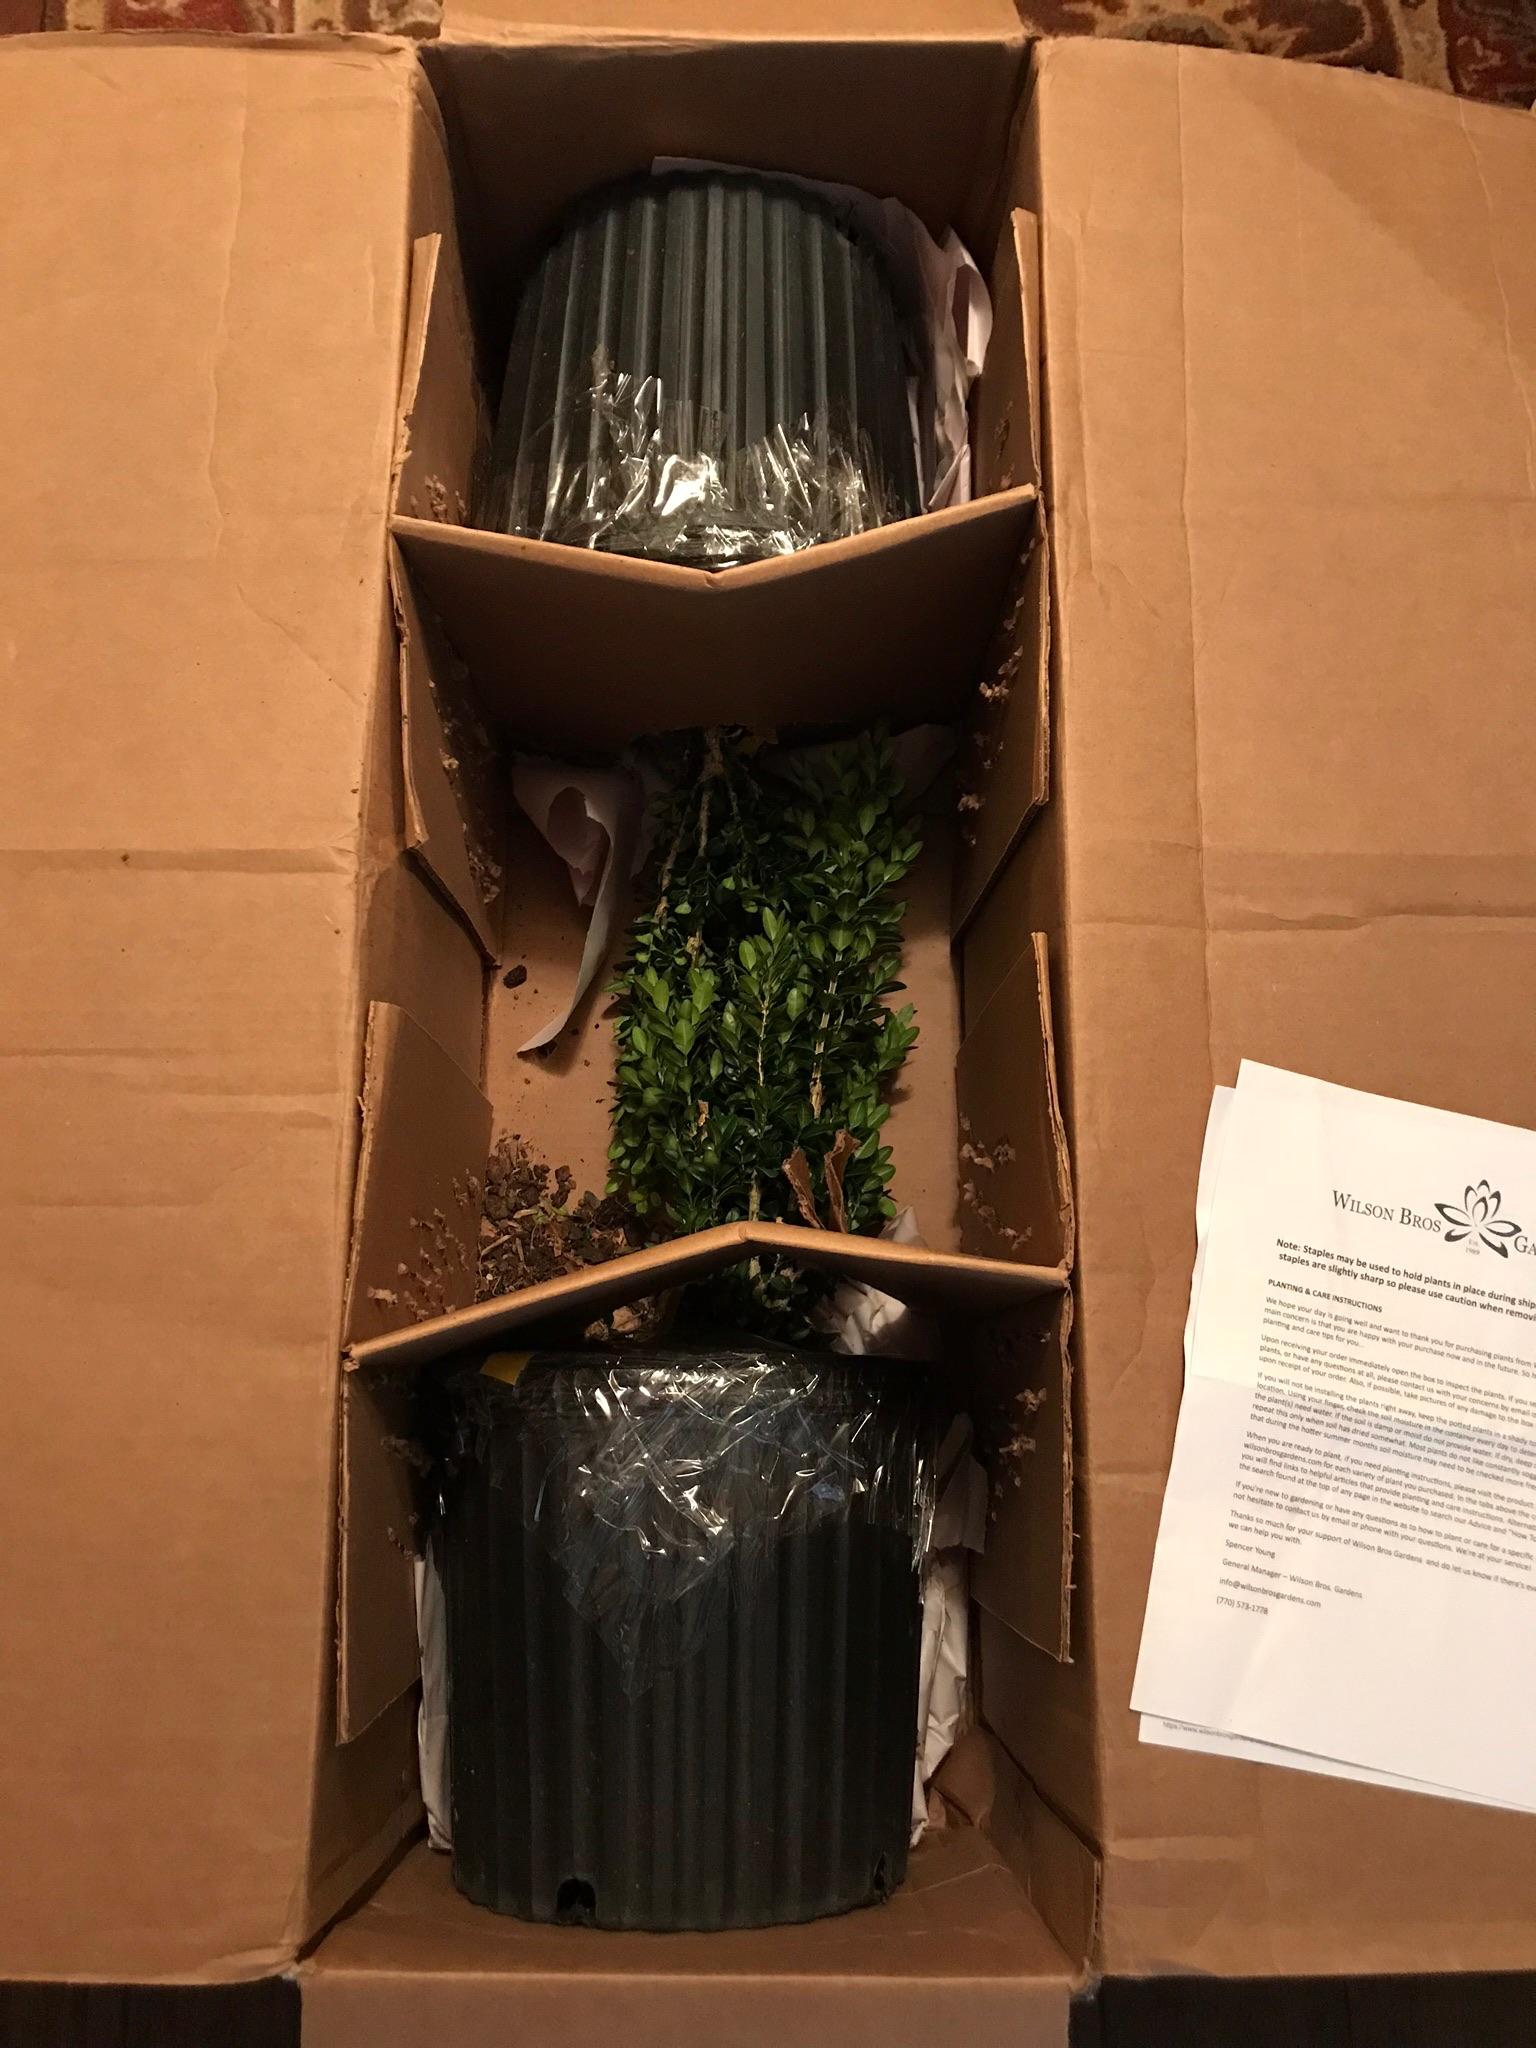 Buy Dee Runk Columnar Boxwood Plants For Sale Online From Wilson ...